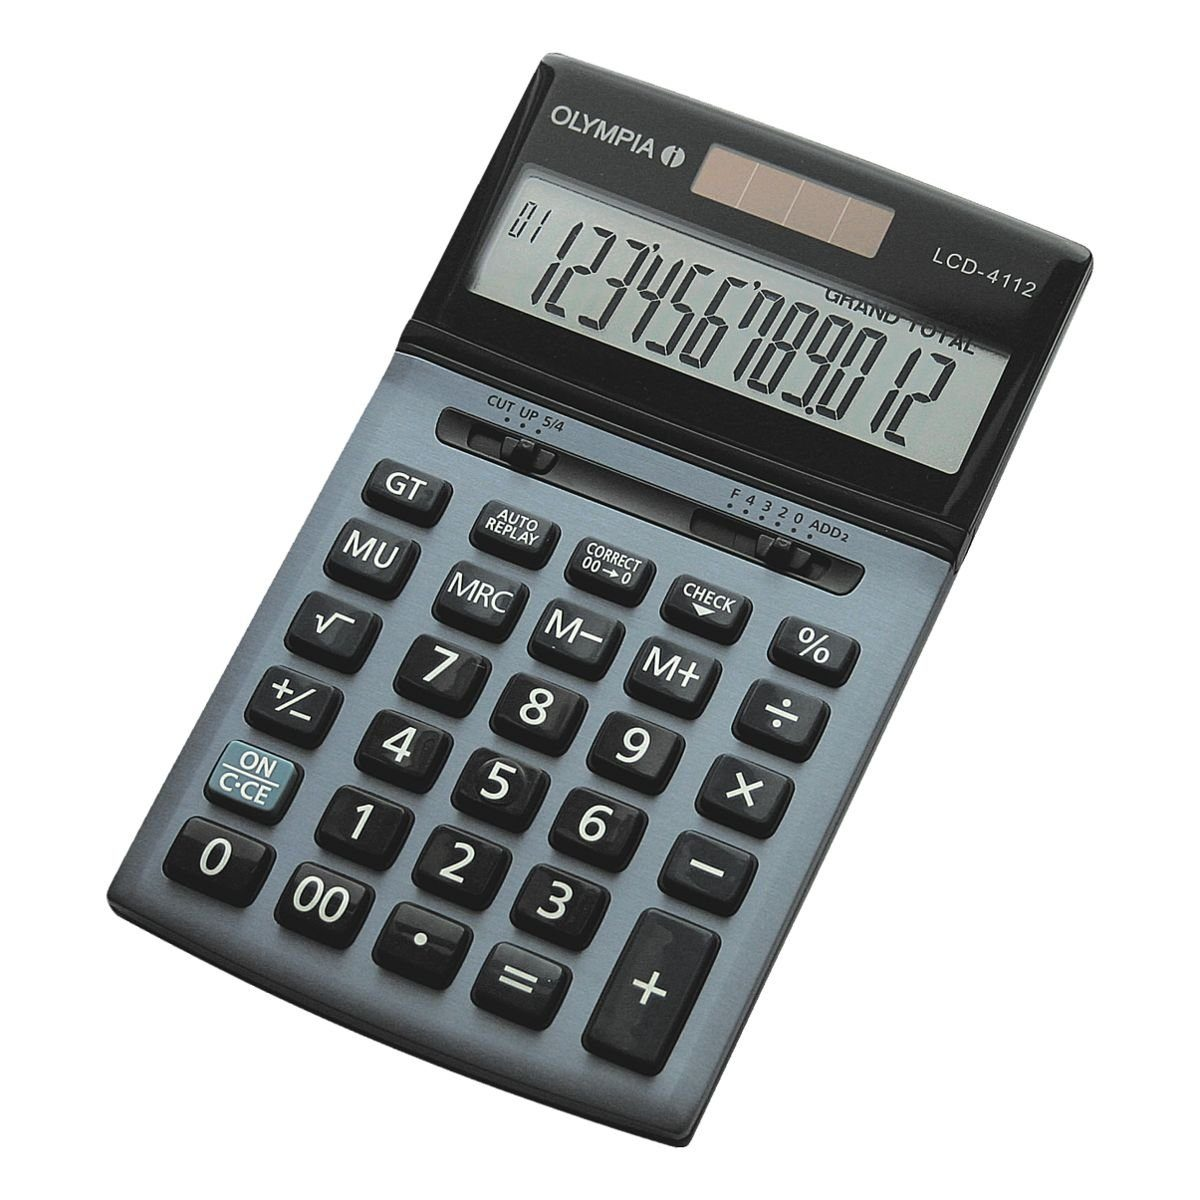 OLYMPIA OFFICE Tischrechner »LCD 4112«